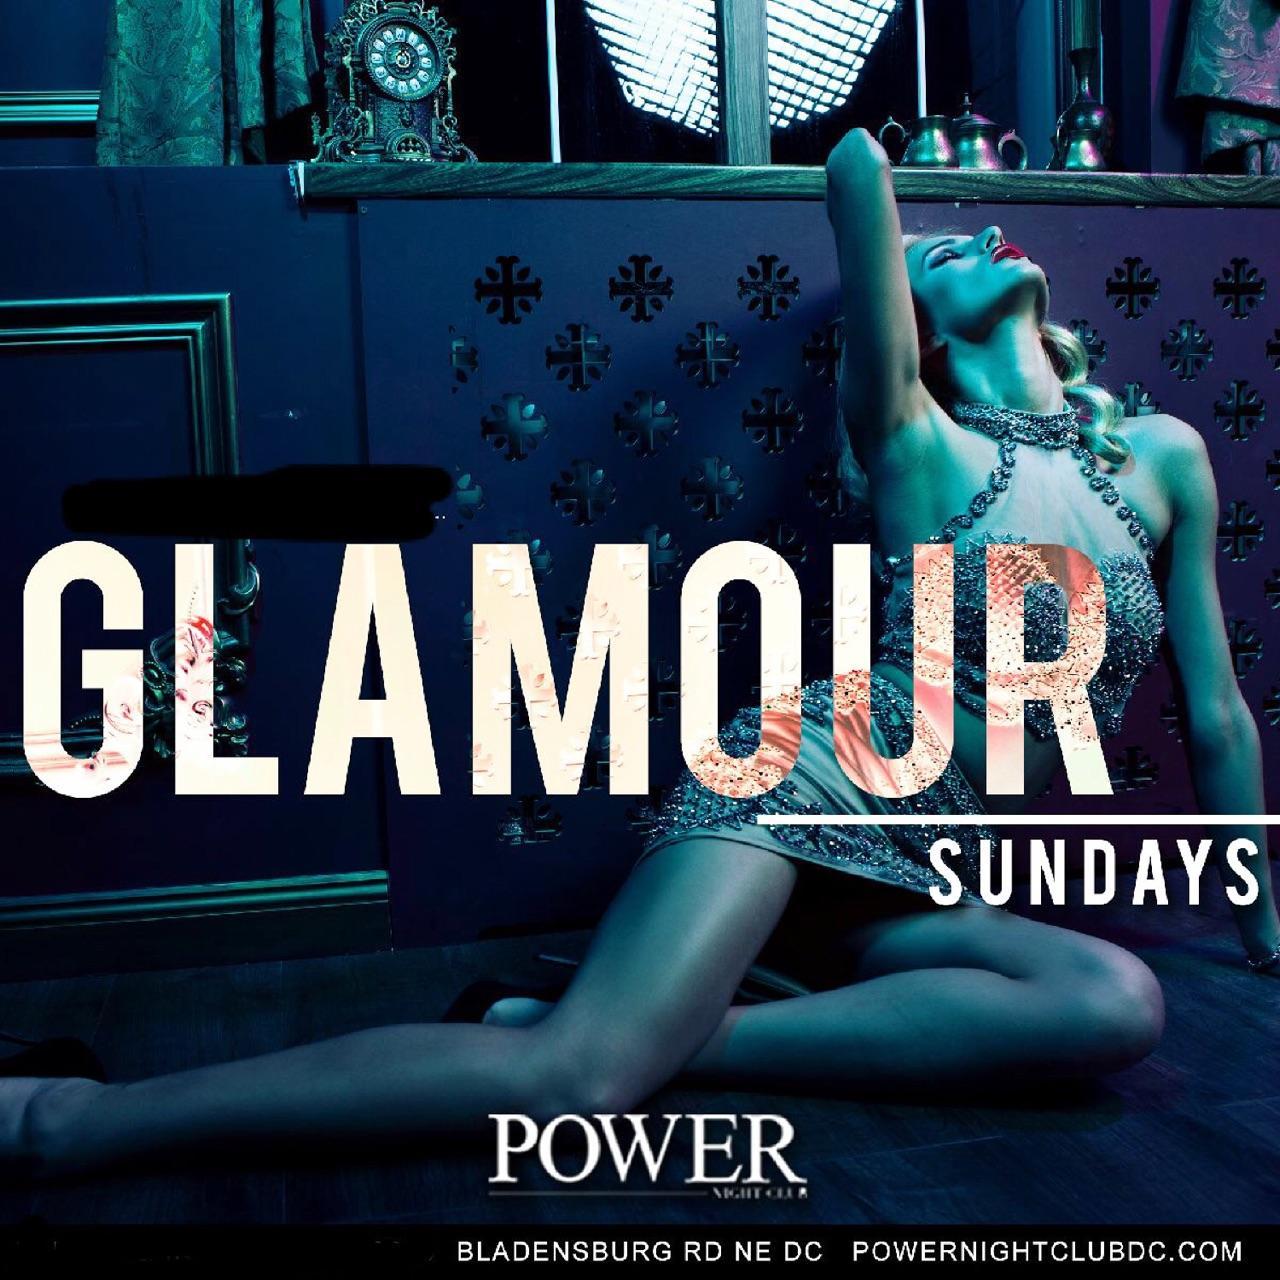 Power Sunday, Power Night Club, Washington, D.C.